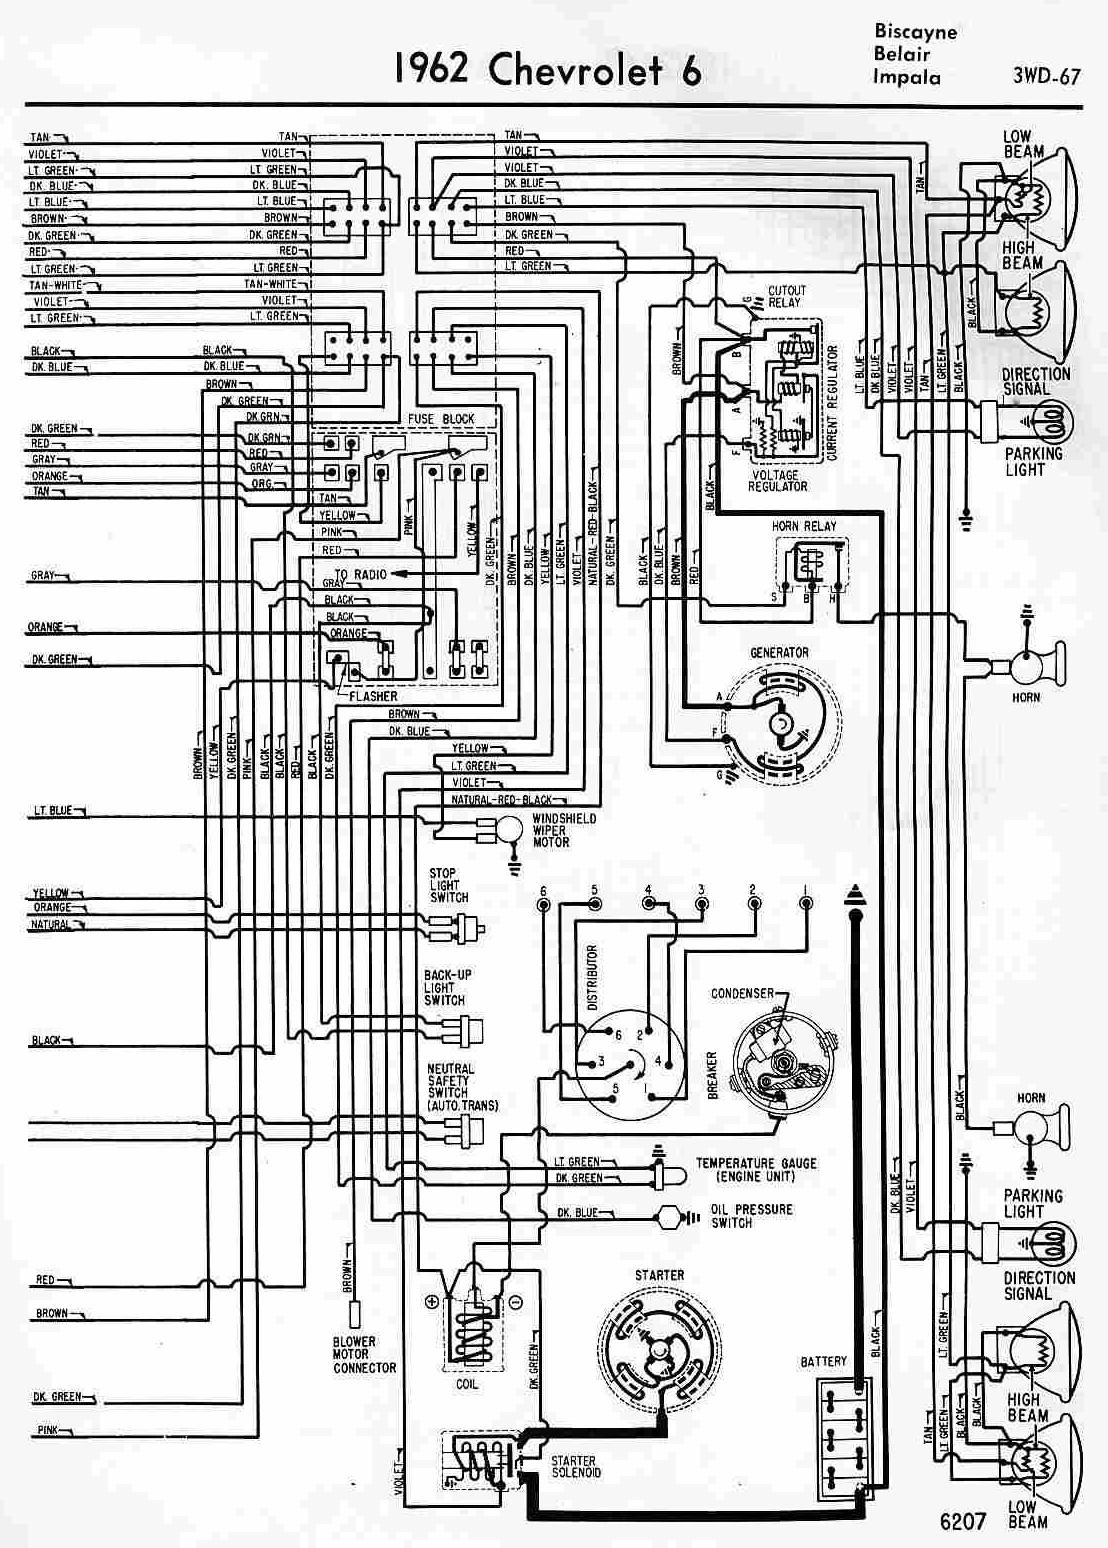 Brilliant Wiring Diagram 2009 Chevy Impala Ltz Basic Electronics Wiring Diagram Wiring Cloud Licukshollocom